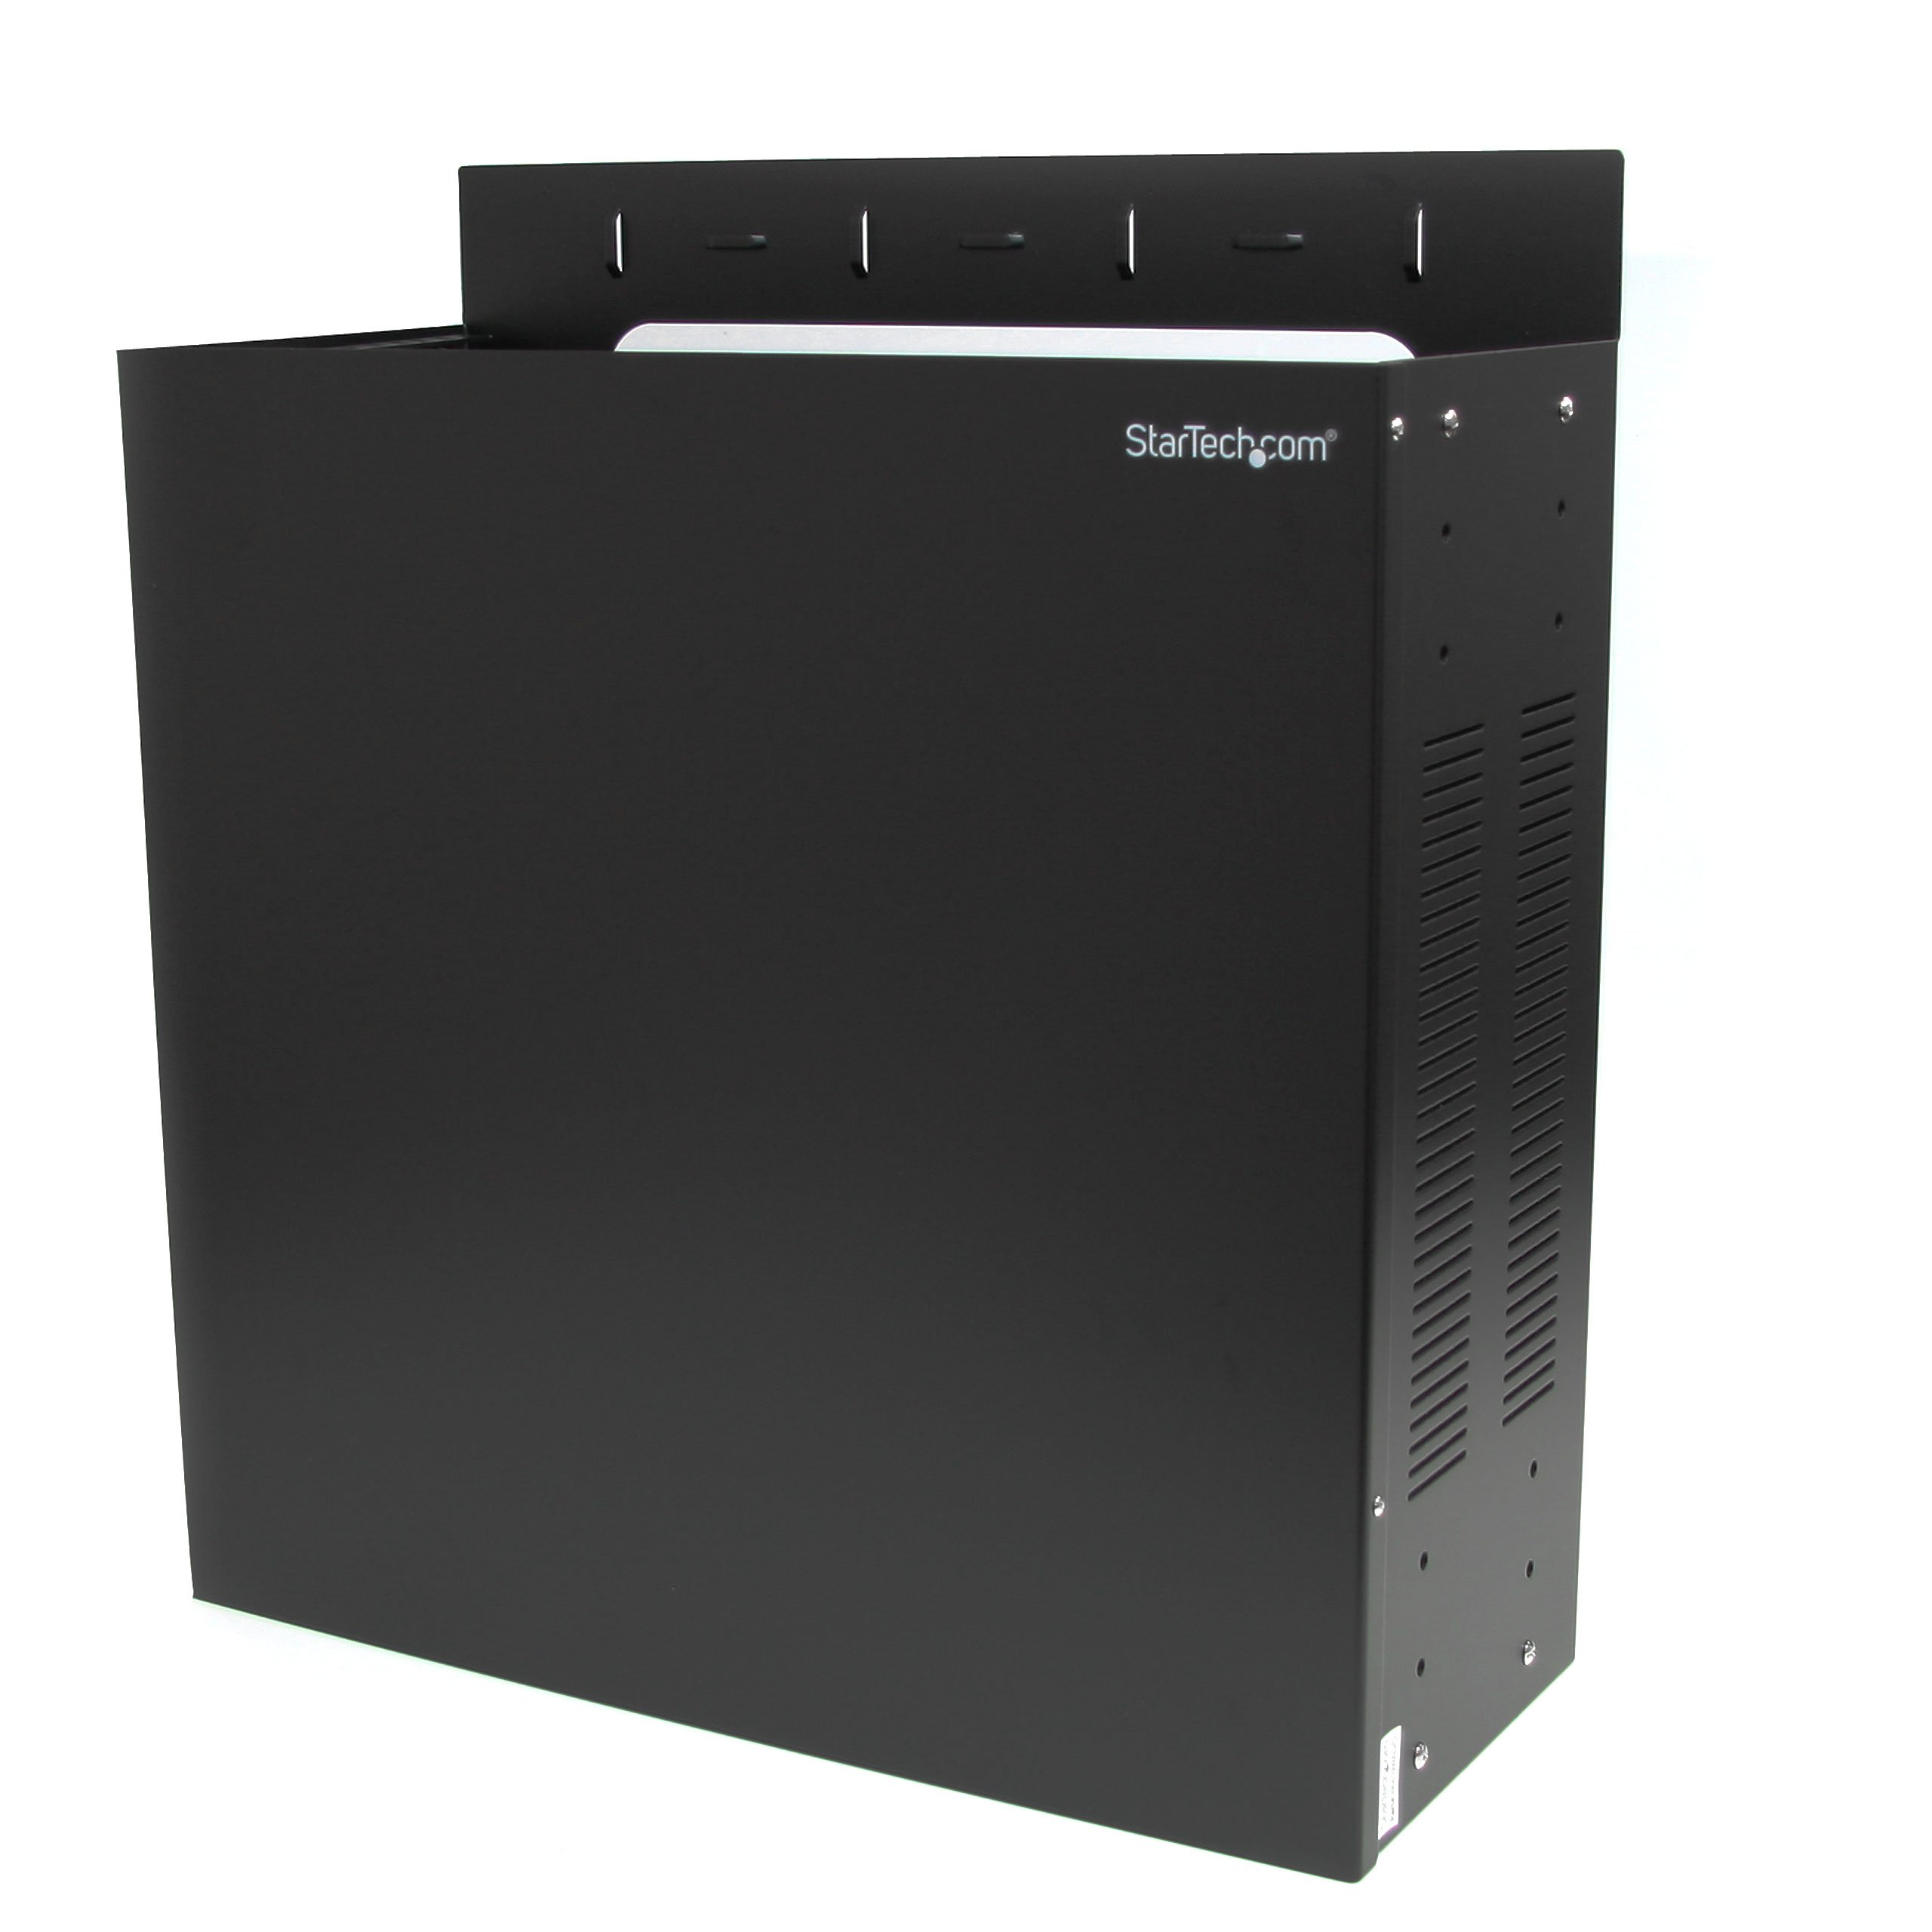 StarTech.com 4U 19-Inch Steel Horizontal Wall Mountable Server Rack RK419WALVO (Black) by StarTech (Image #1)